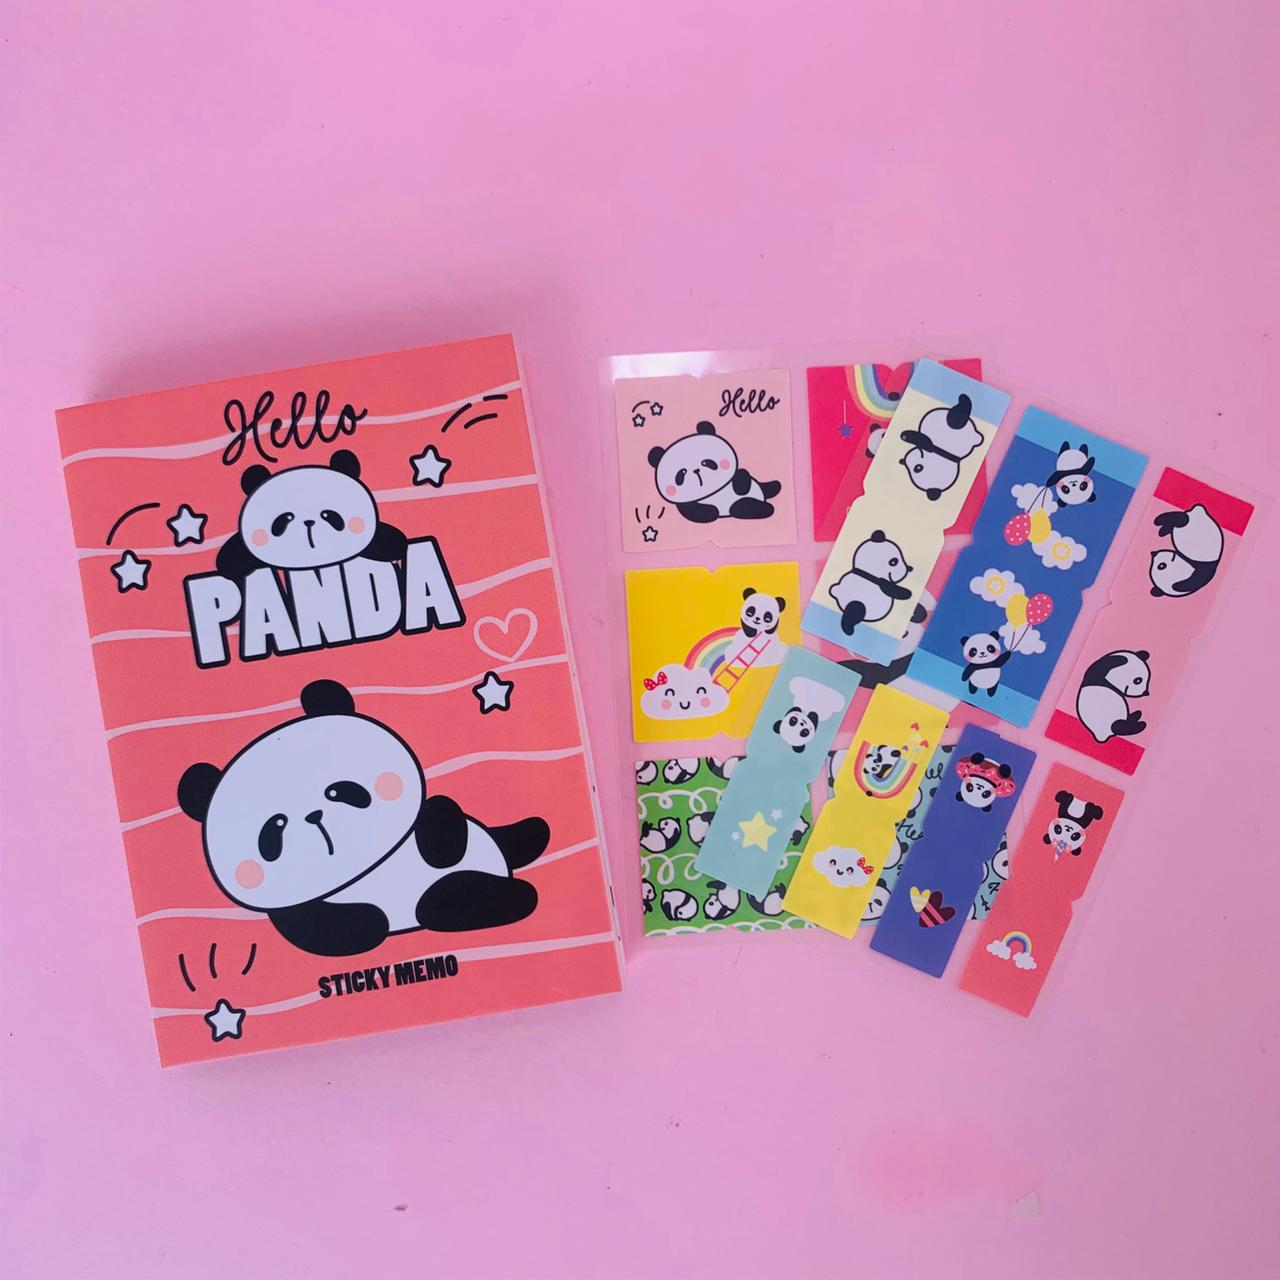 Bloco Adesivado Livrinho Decorativo Post it Panda | Importado - Verde